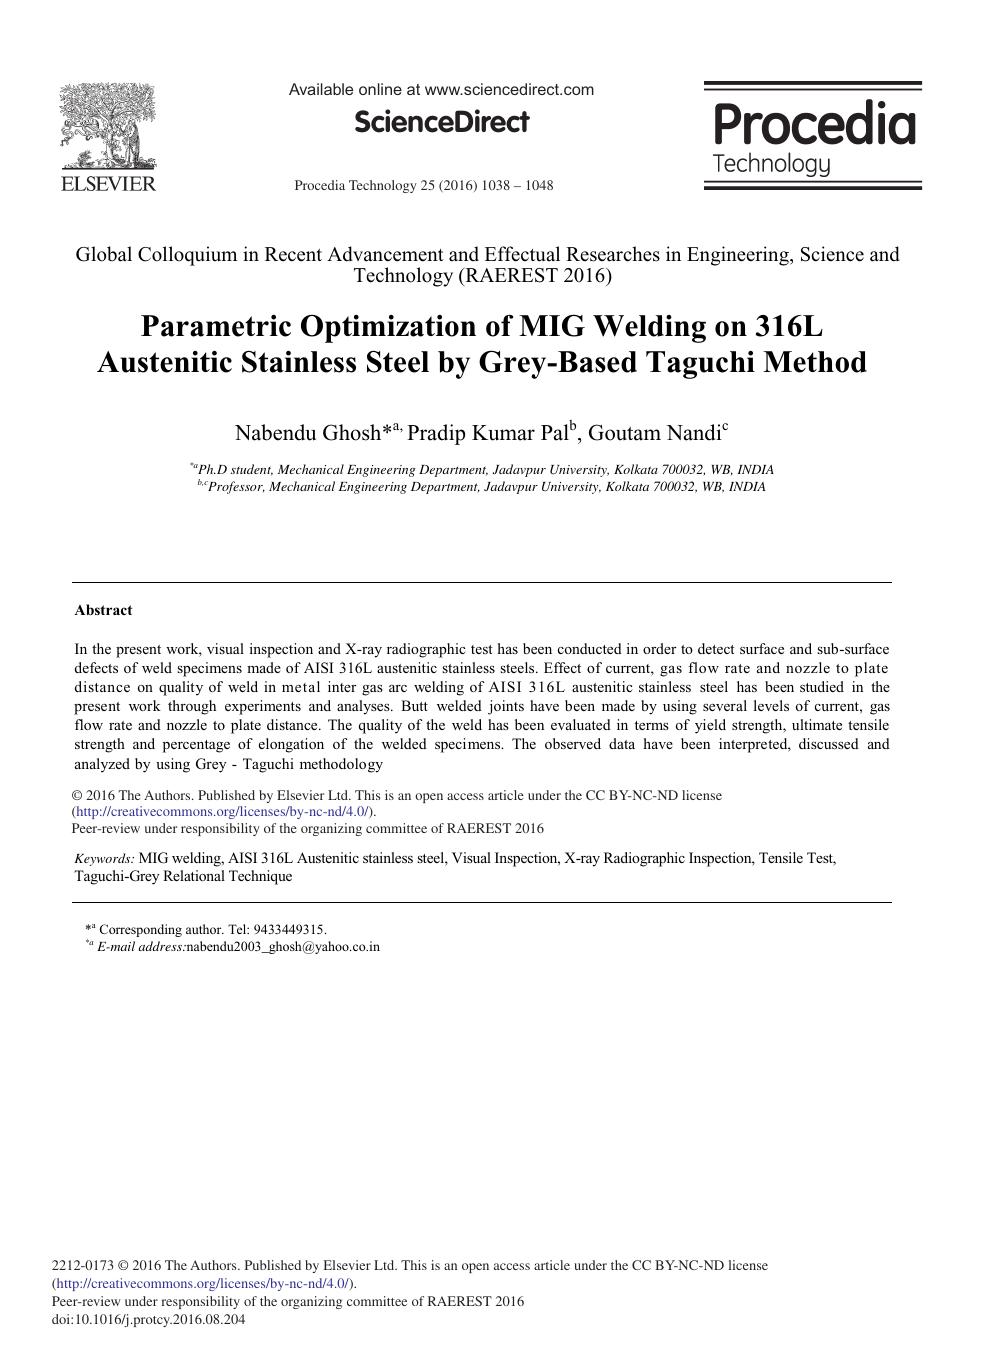 Parametric Optimization of MIG Welding on 316L Austenitic